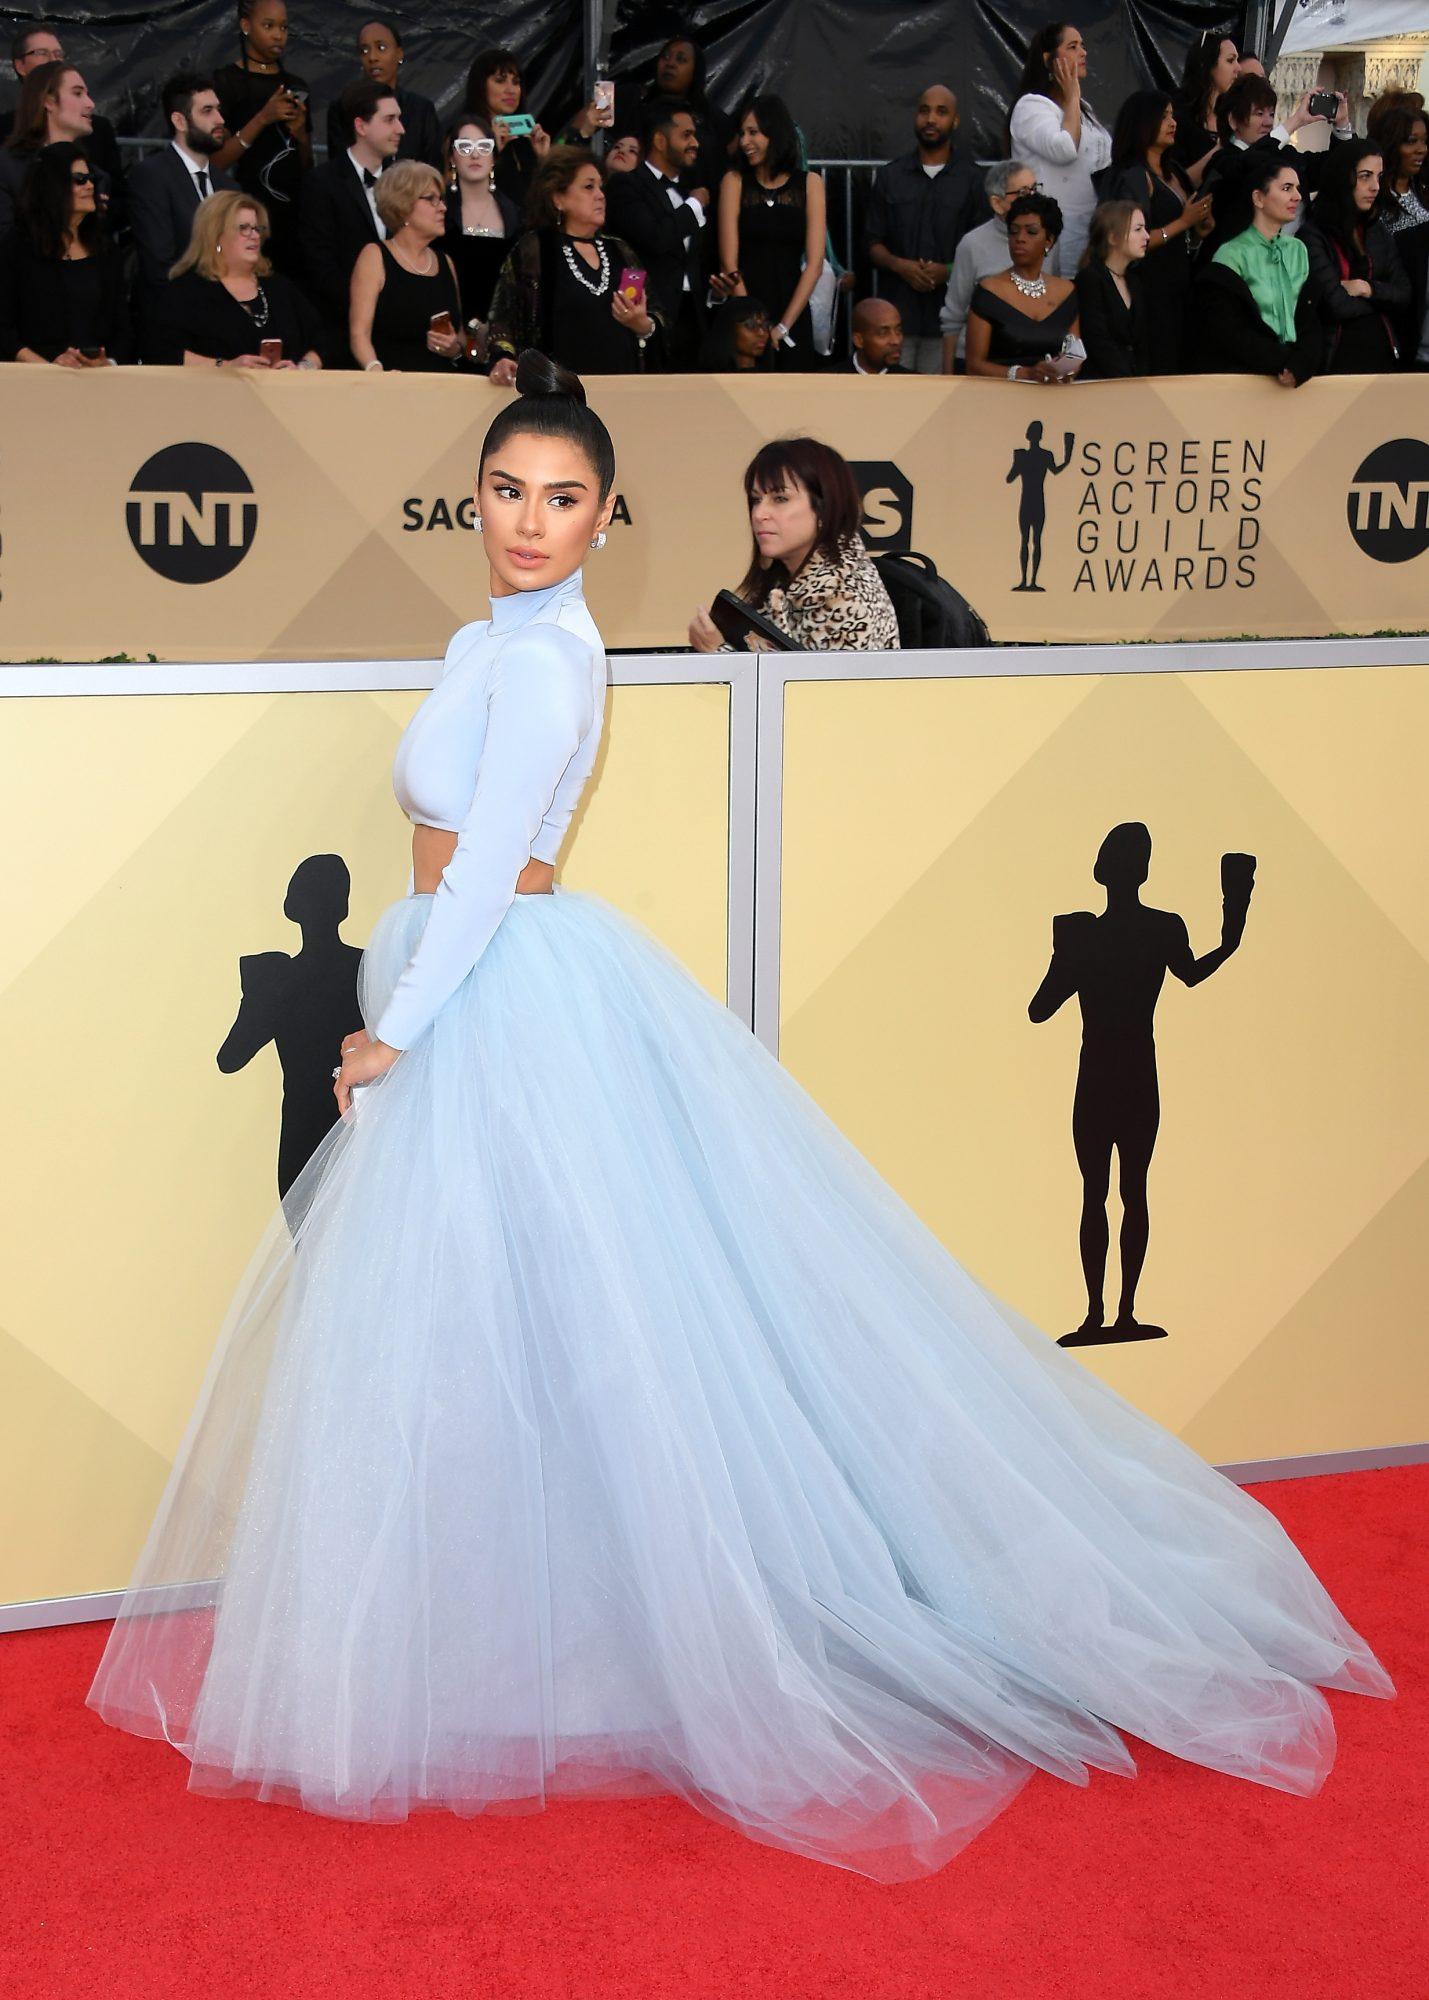 Diane Guerrero, looks, Sag awards, peinado, belleza